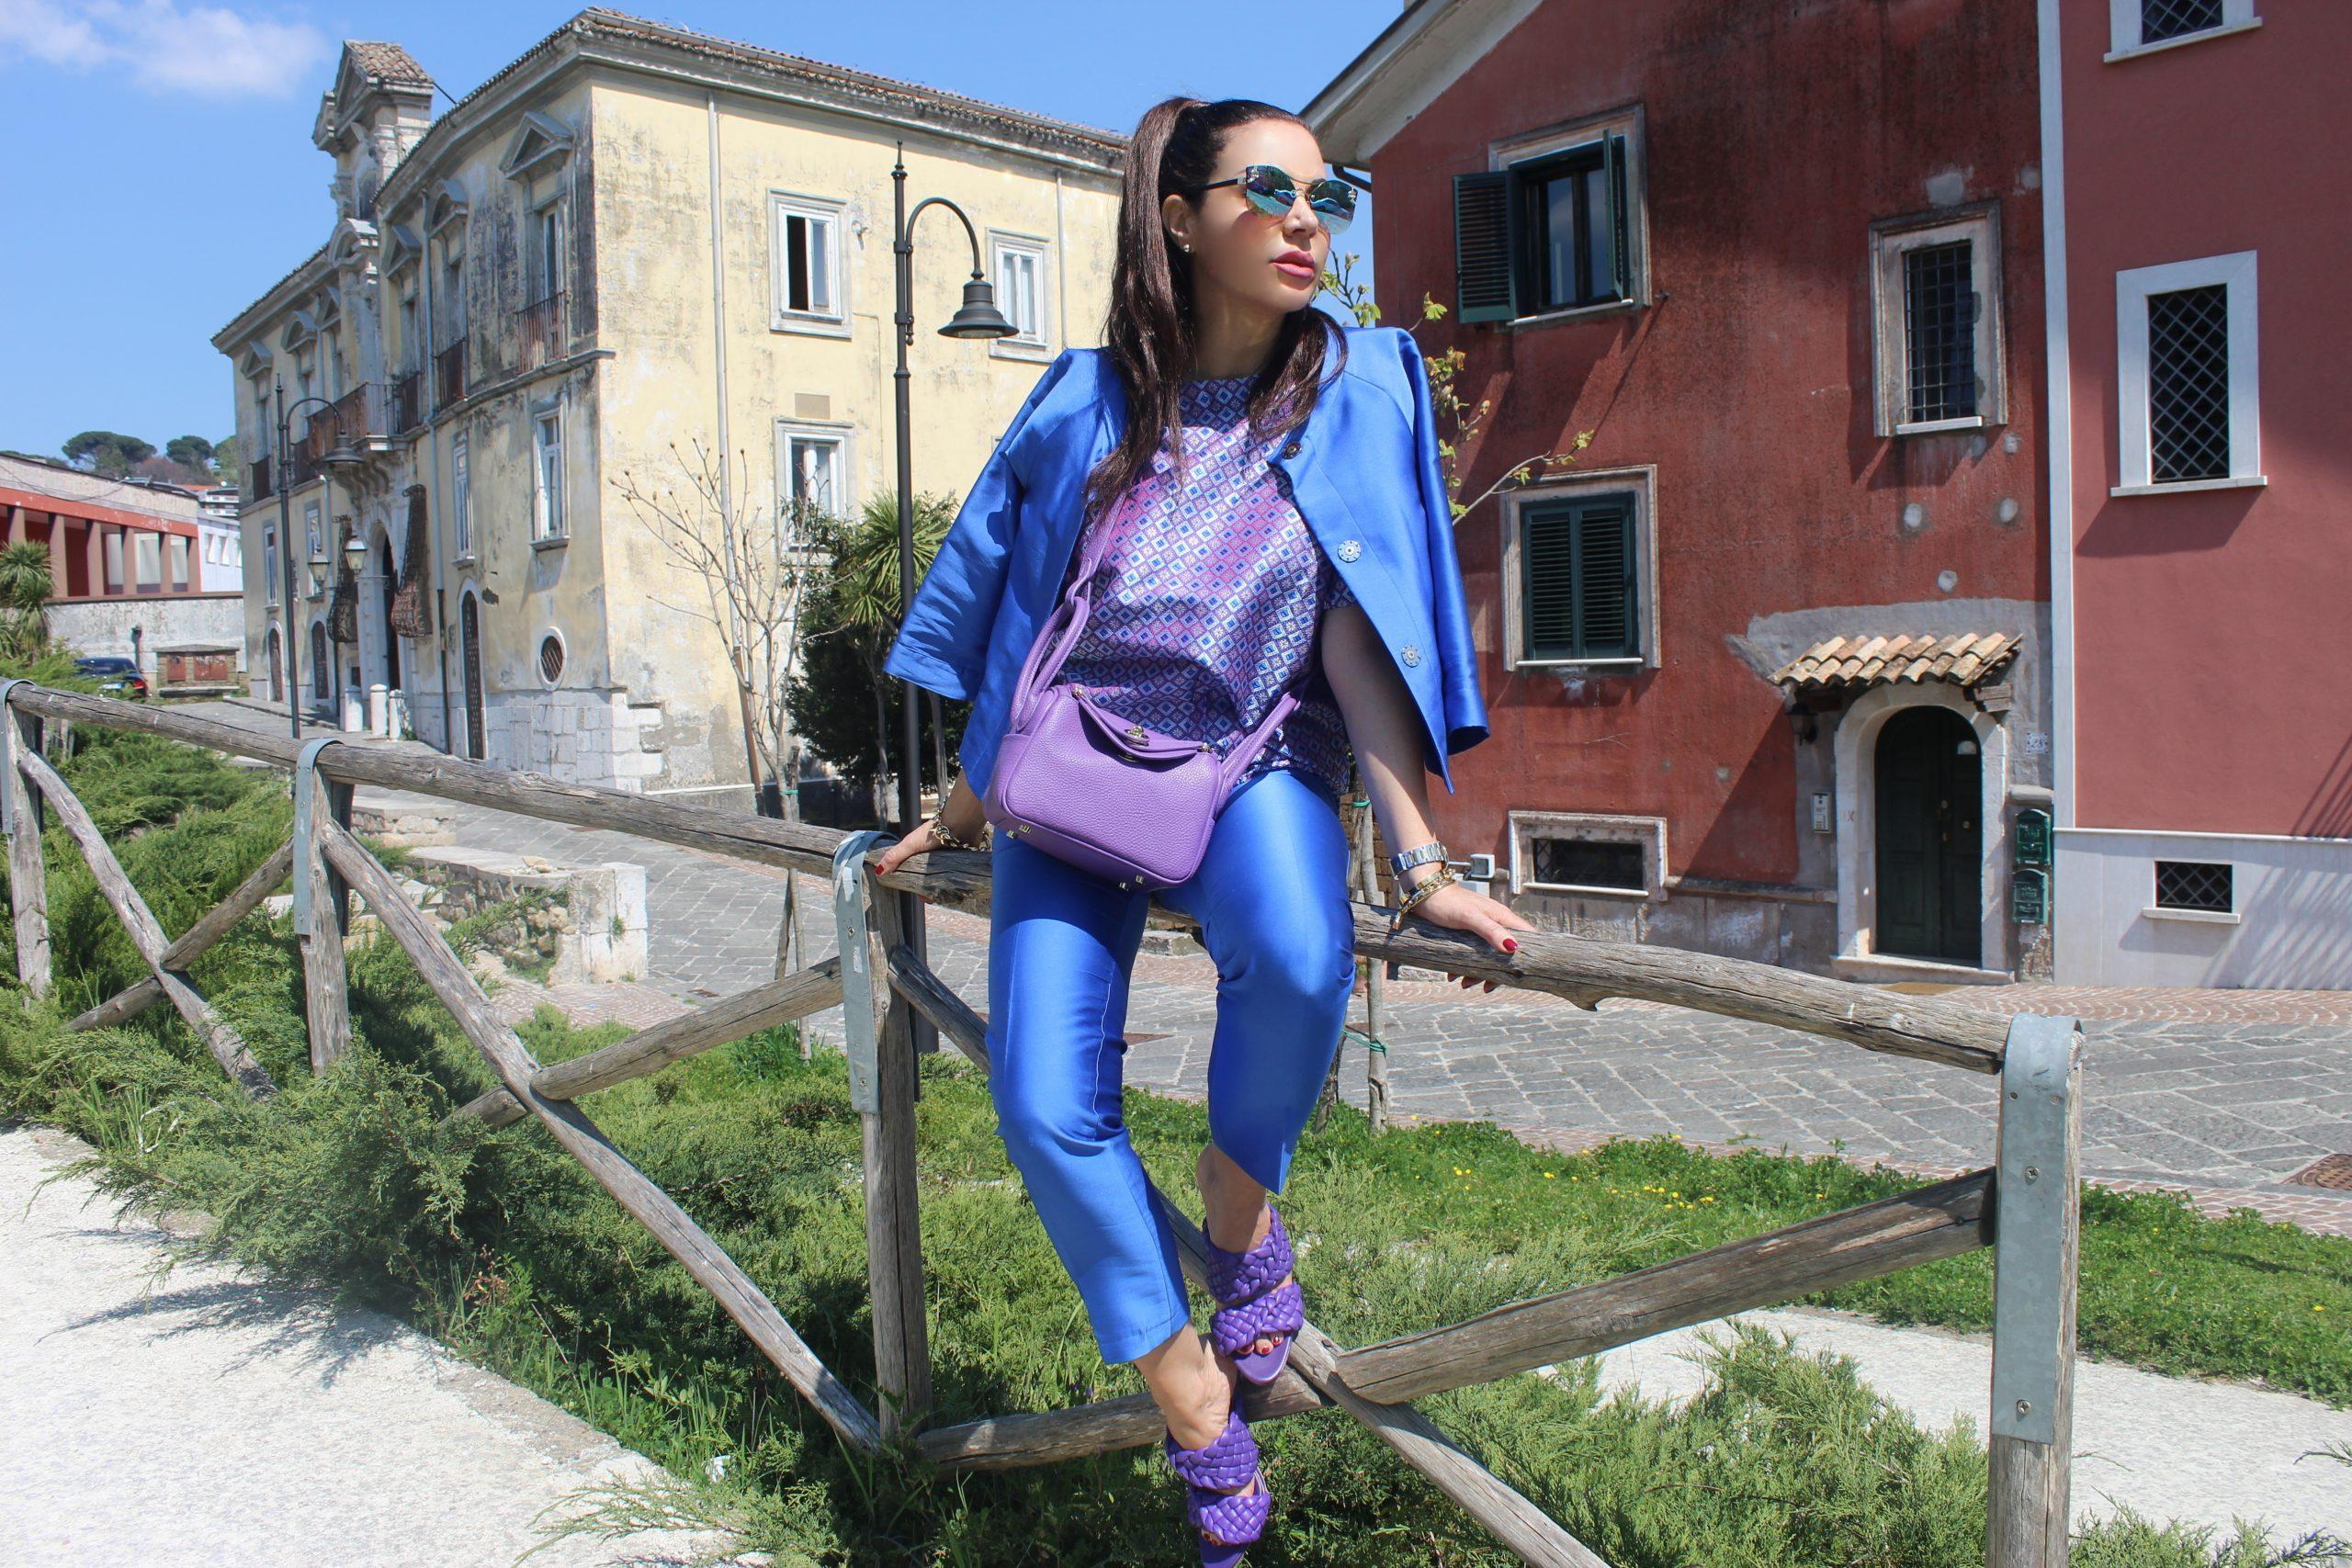 Fall Trend 2021 Vibrant Color combination PINKO blazer and trousers ODI ET AMO blouse  HERMES bag  BOTTEGA VENETA sandals Paola Lauretano